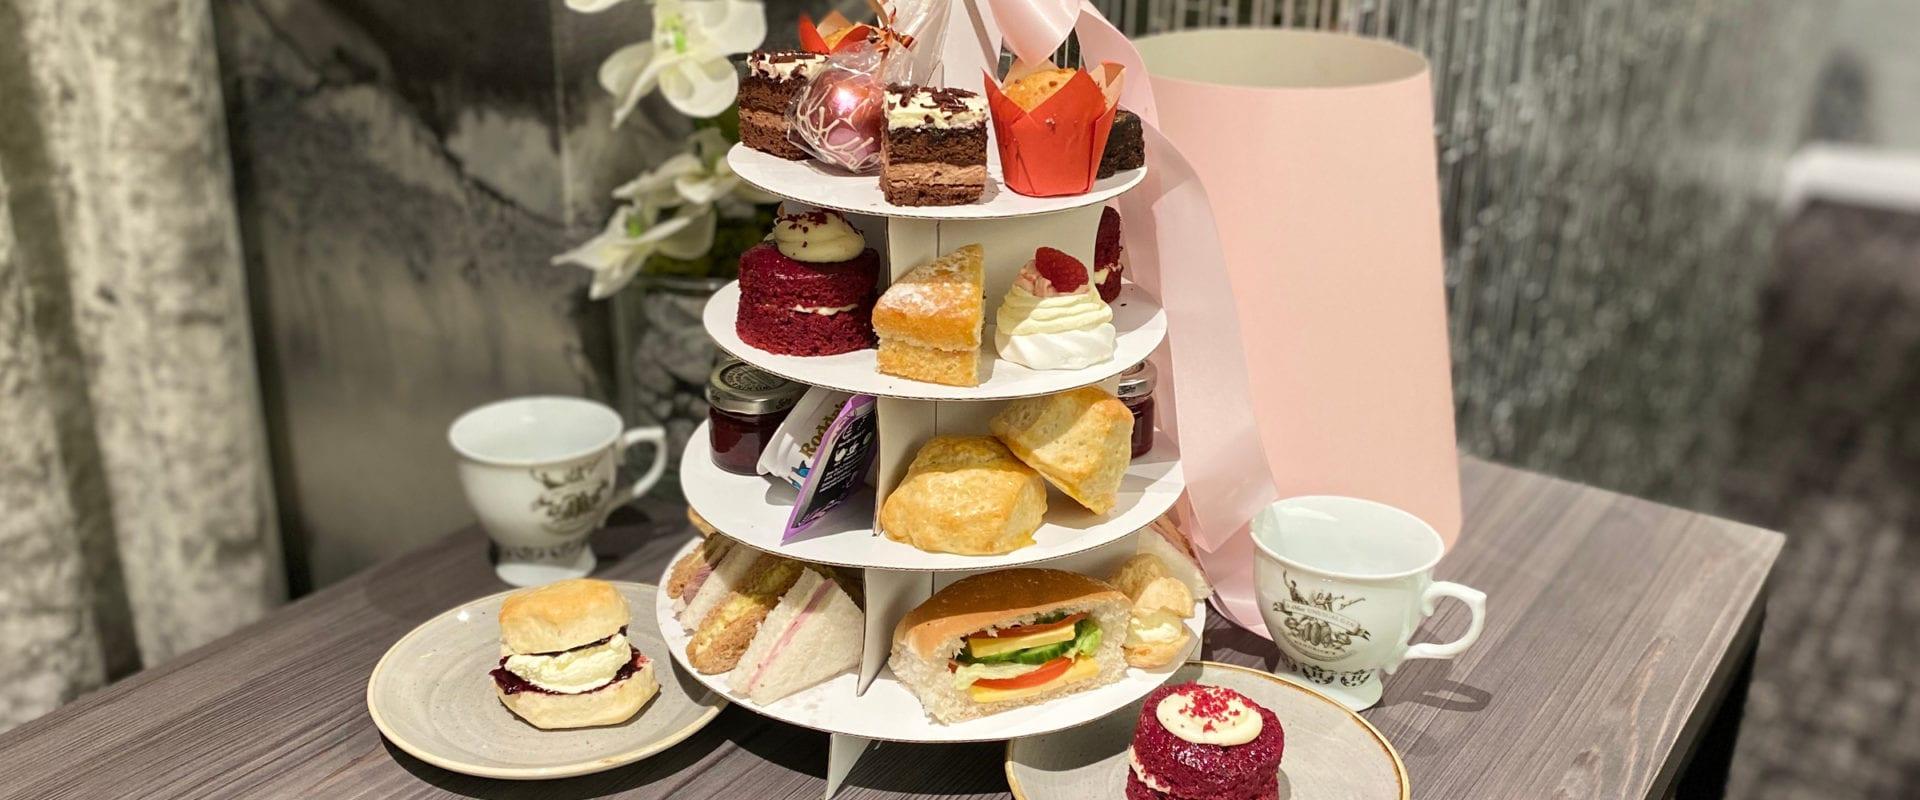 Dalmeny Hotel Mothers Day Dine At Home 2021 Website Header